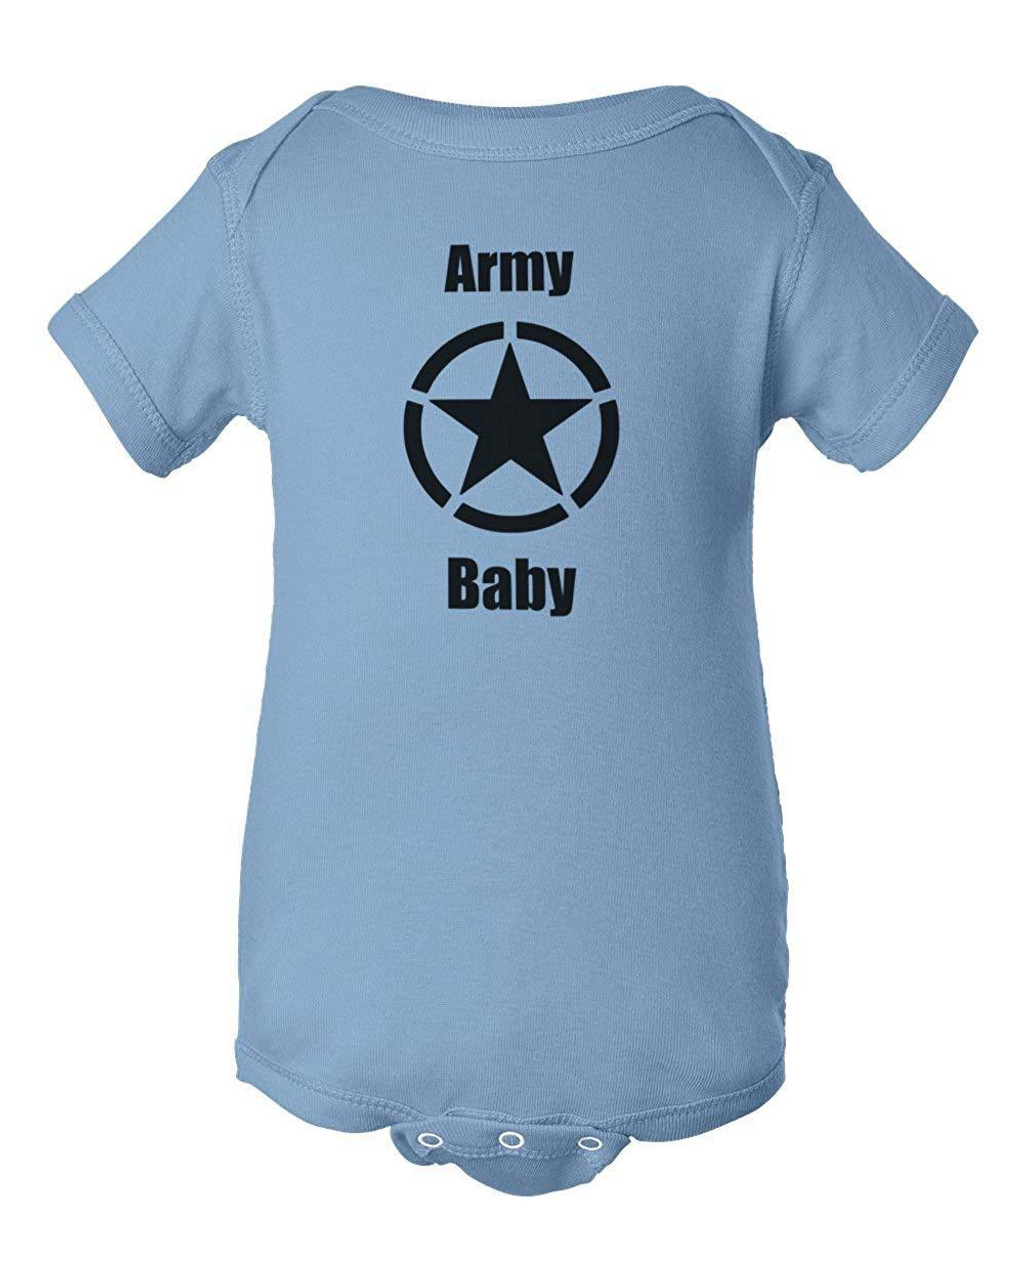 Army Baby Light Blue Clothes Bodysuit Infant Child Jumper